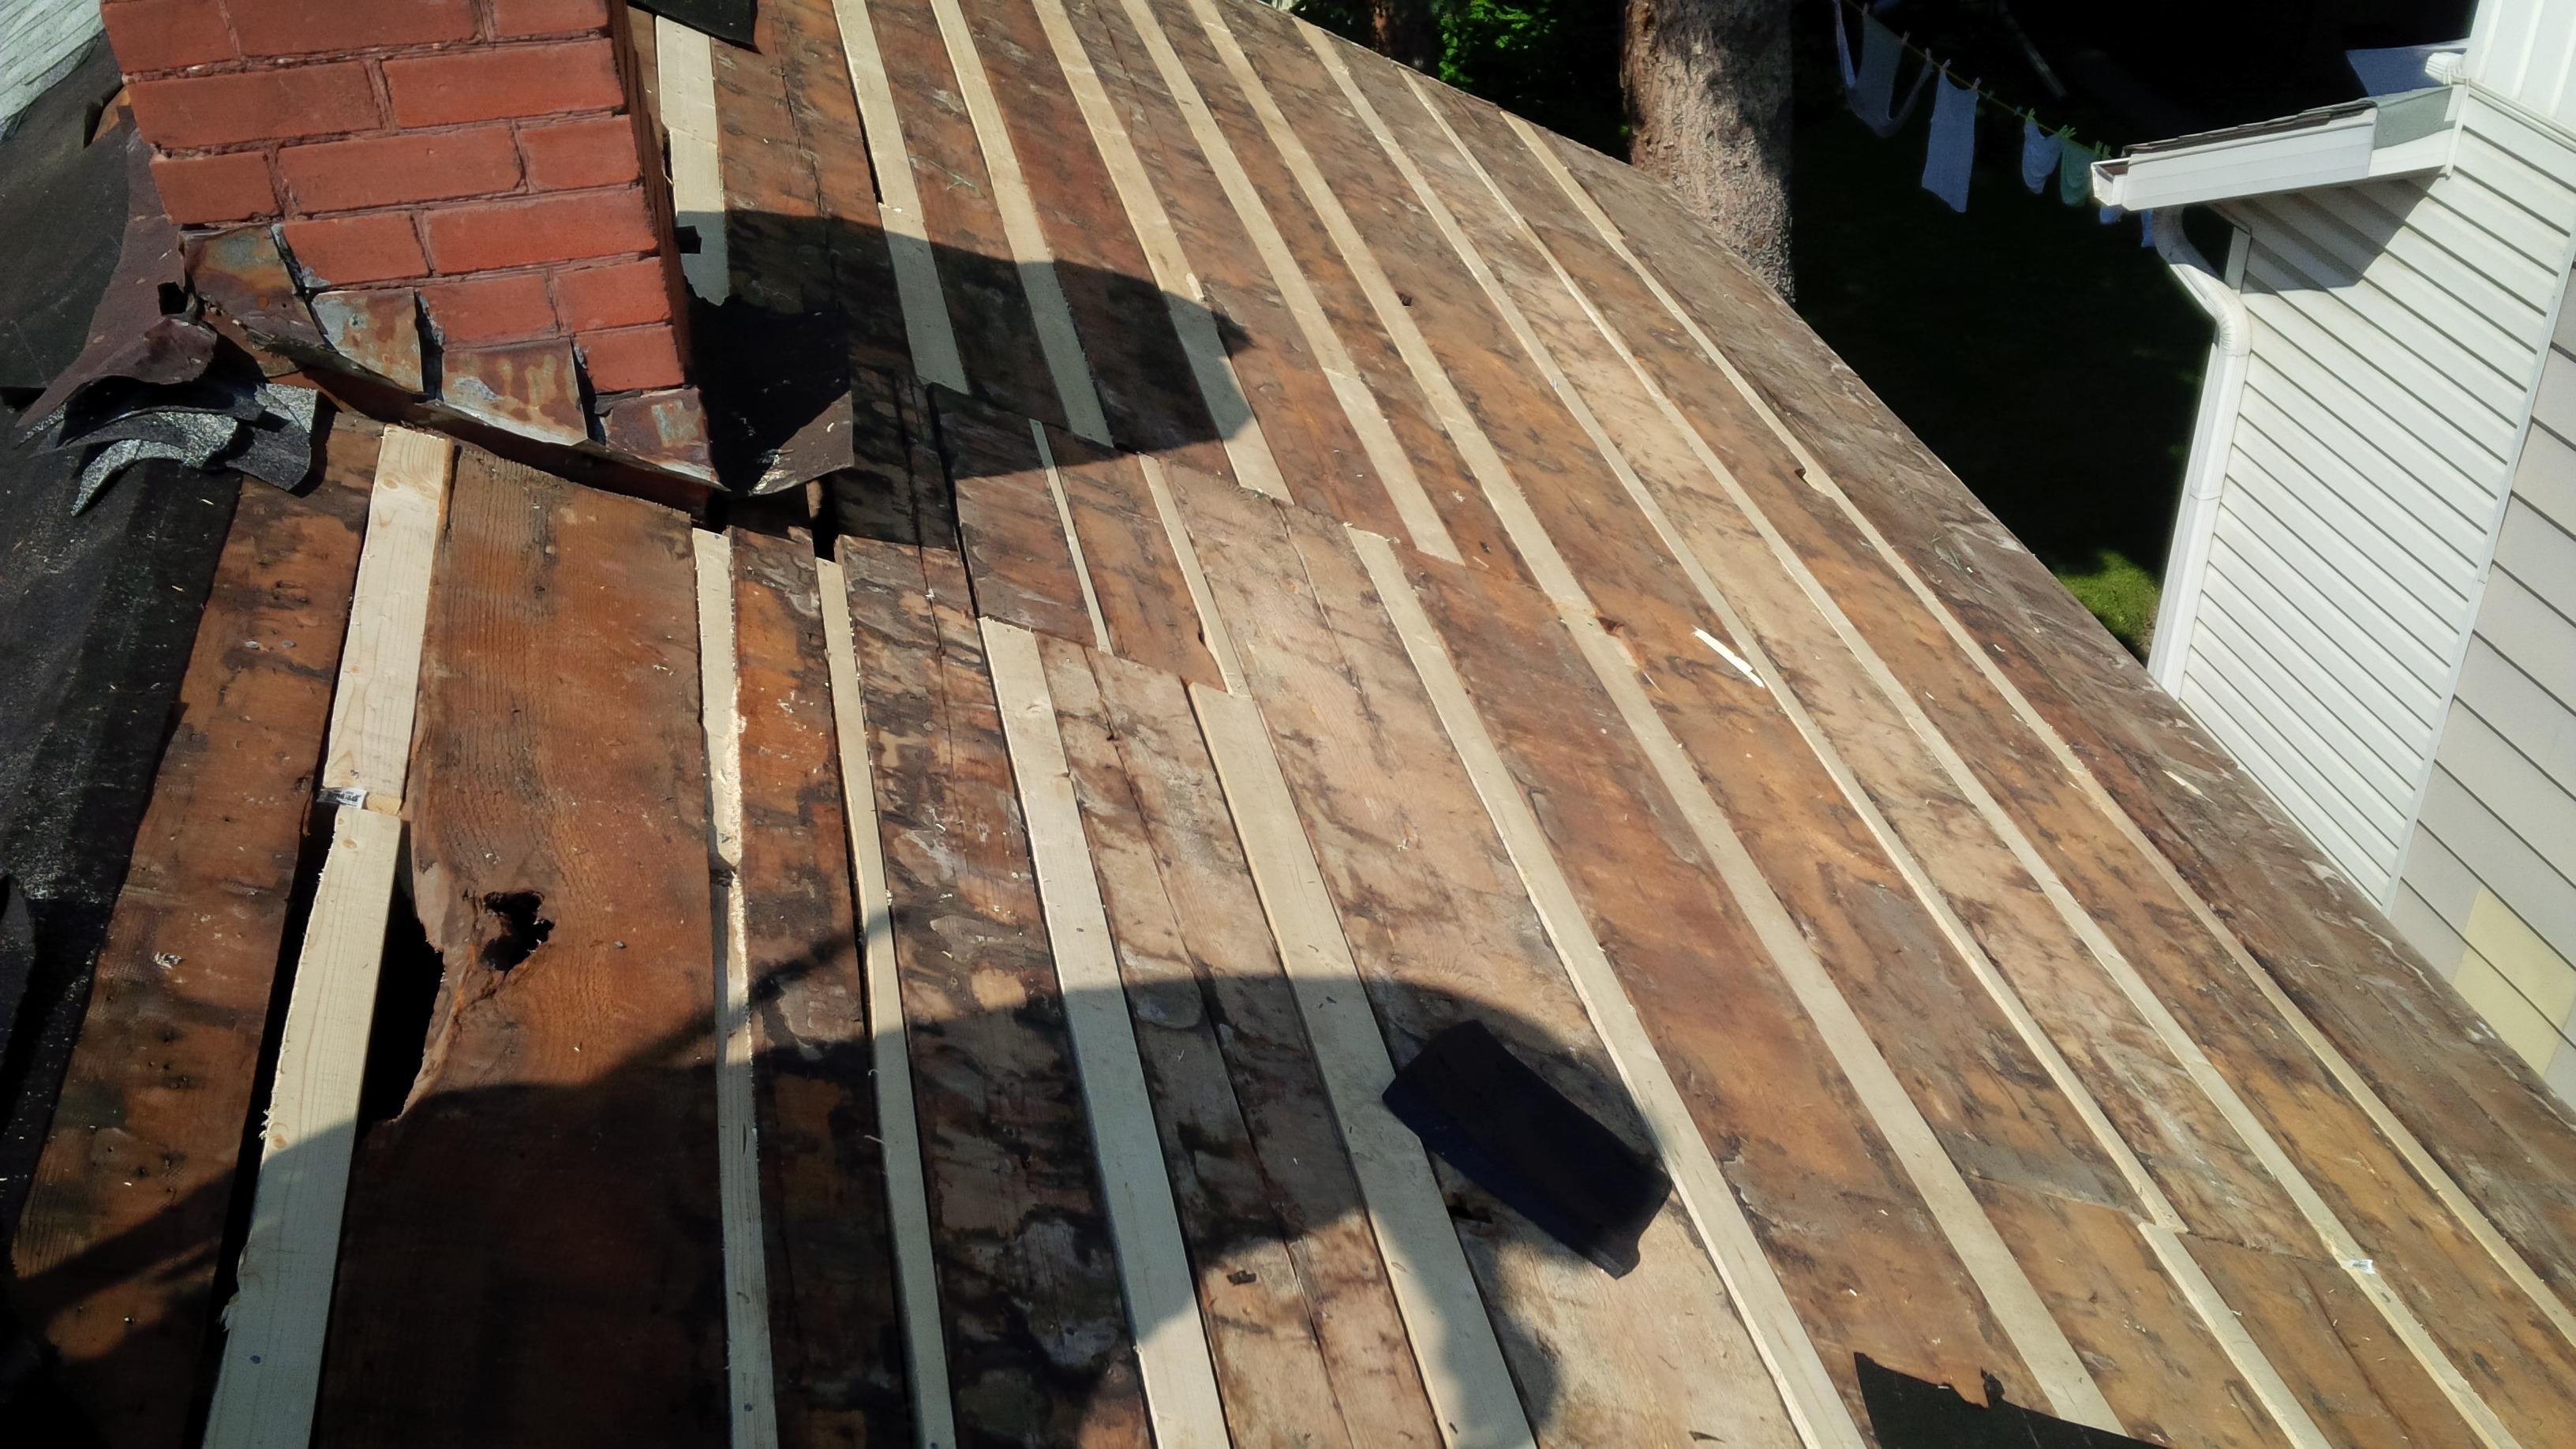 fills gaps in roof deck